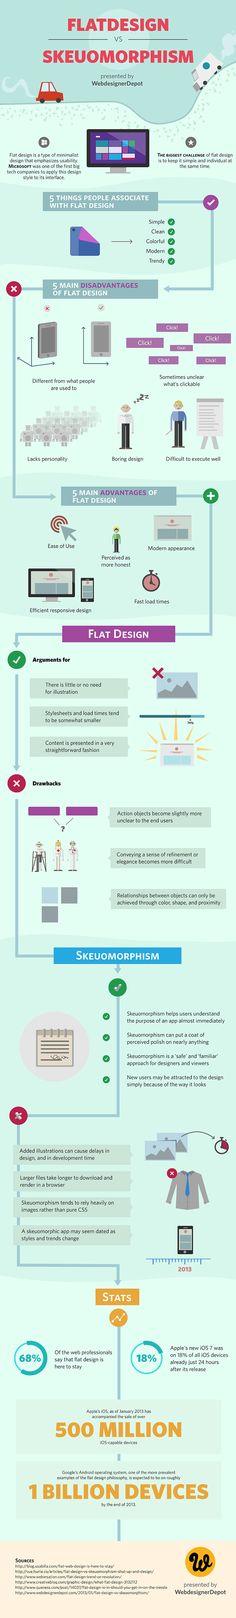 Infographic: Flat design vs. skeuomorphism photo